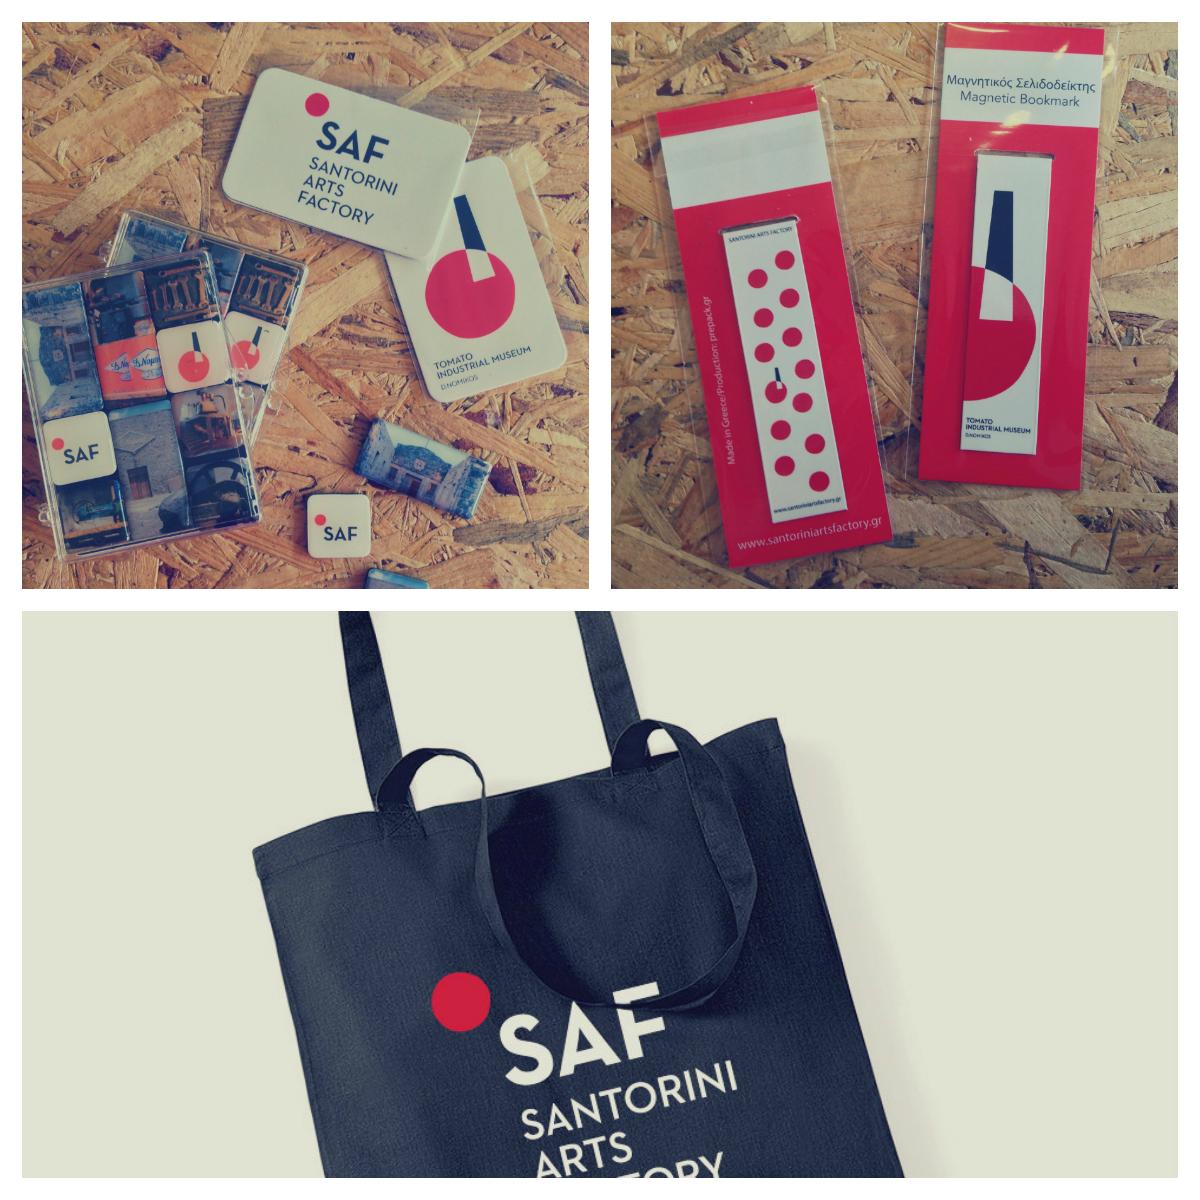 SAF-Santorini Arts Factory